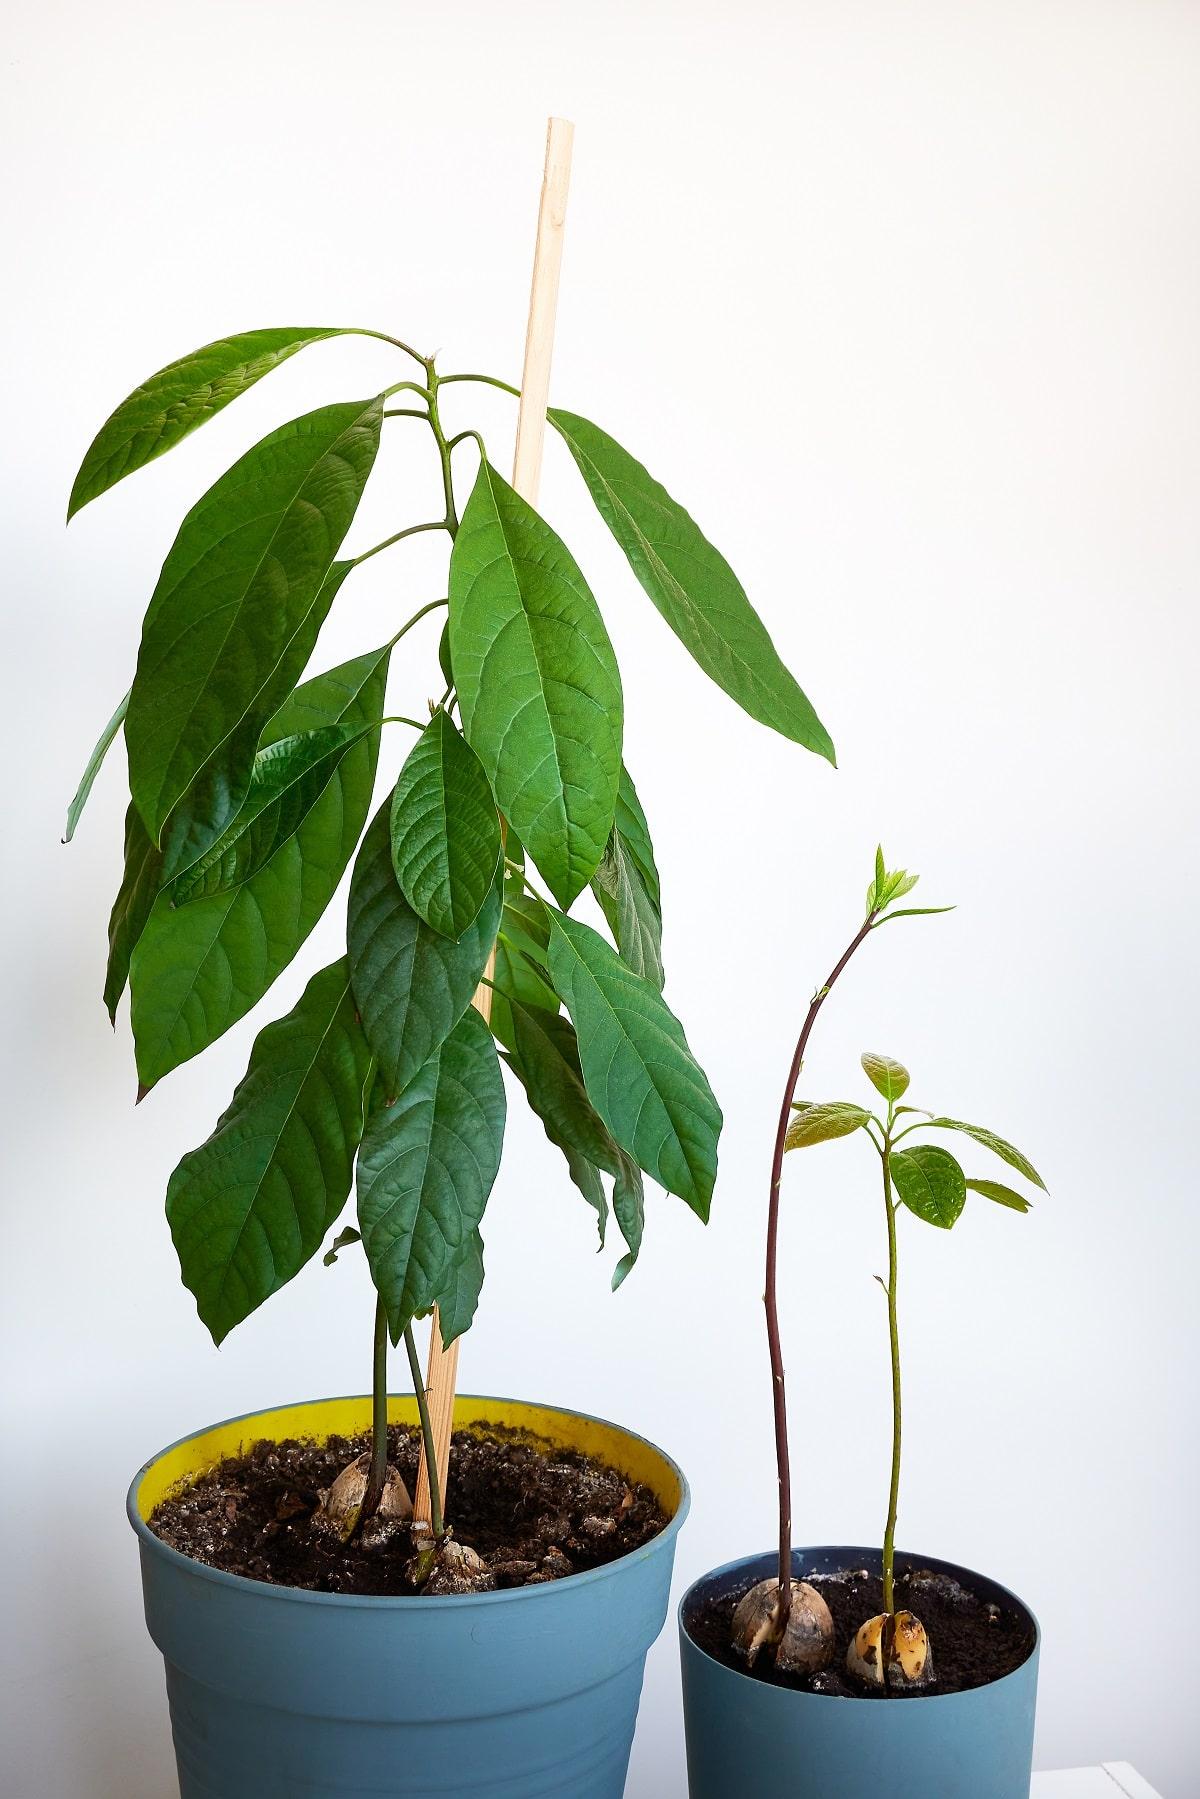 Growing avocado trees